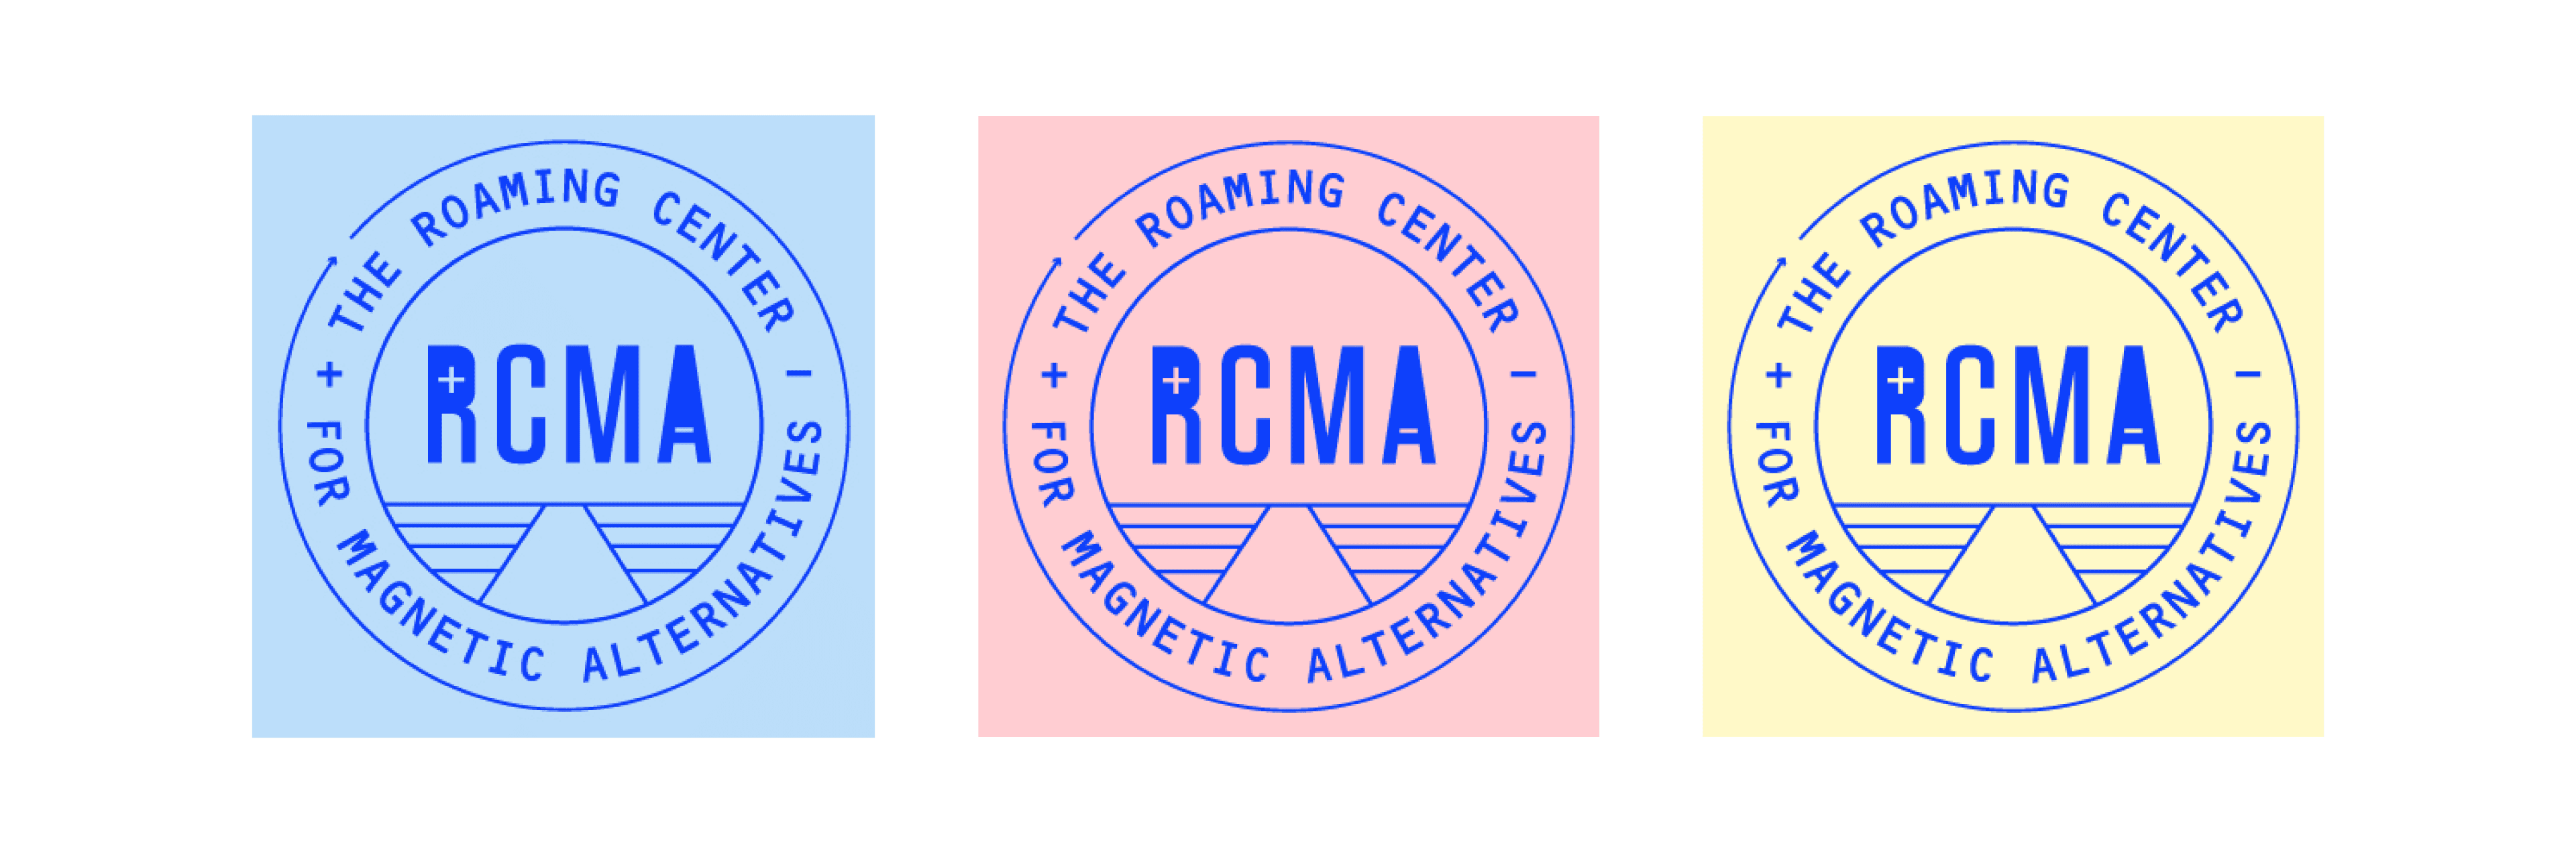 RCMA-Circular-Lockups-Color-BG